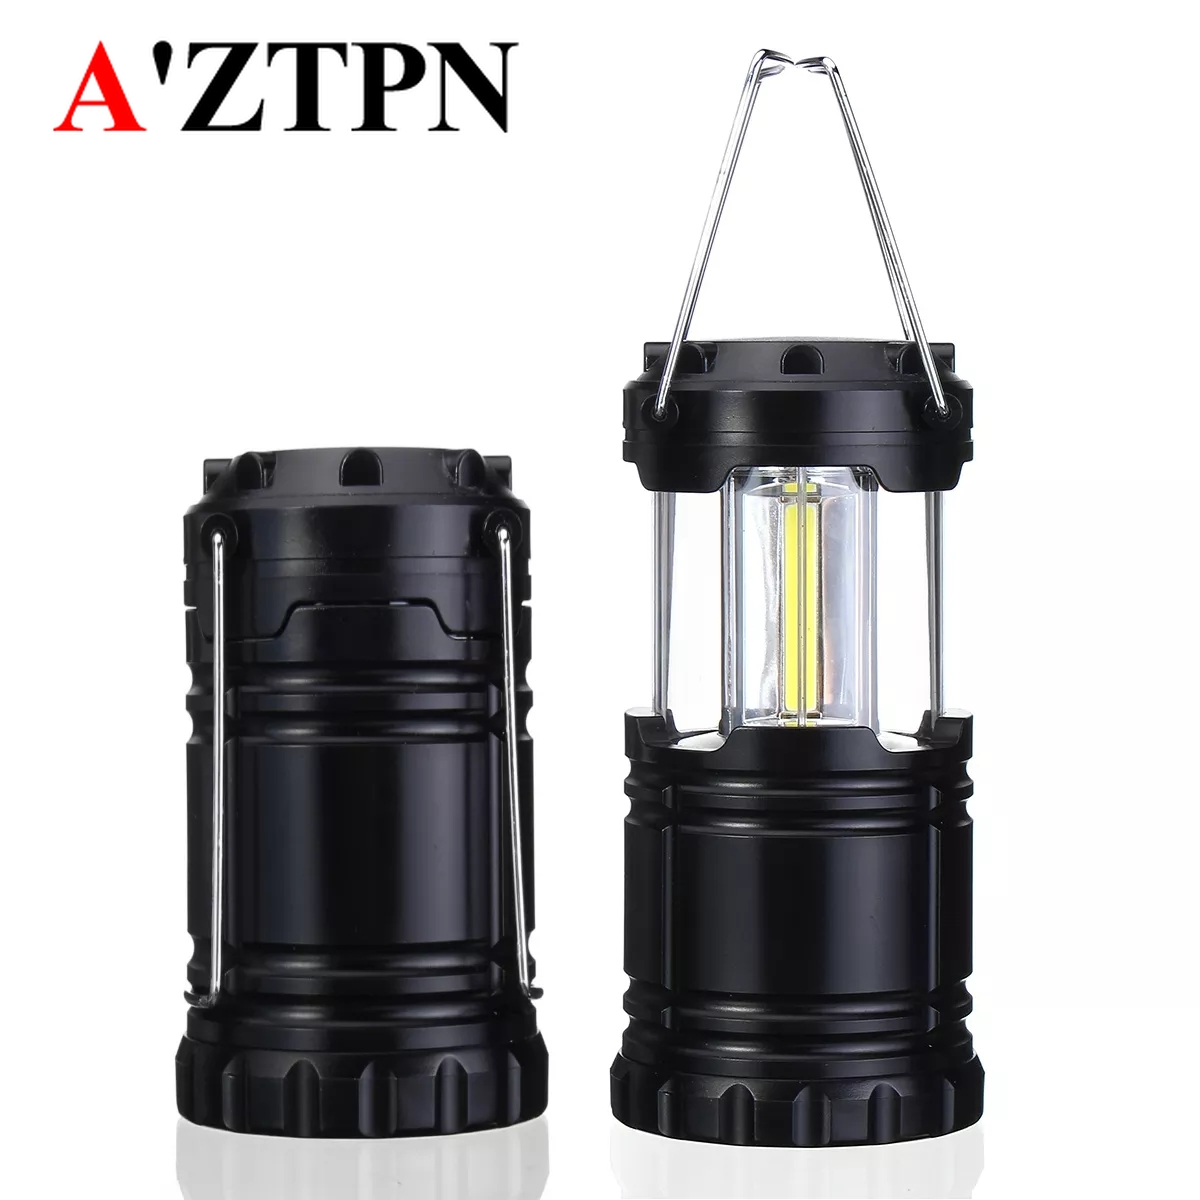 Portable LED Hiking Camping Lantern Tent Fishing Lamp Light USB Rechargeable Jz